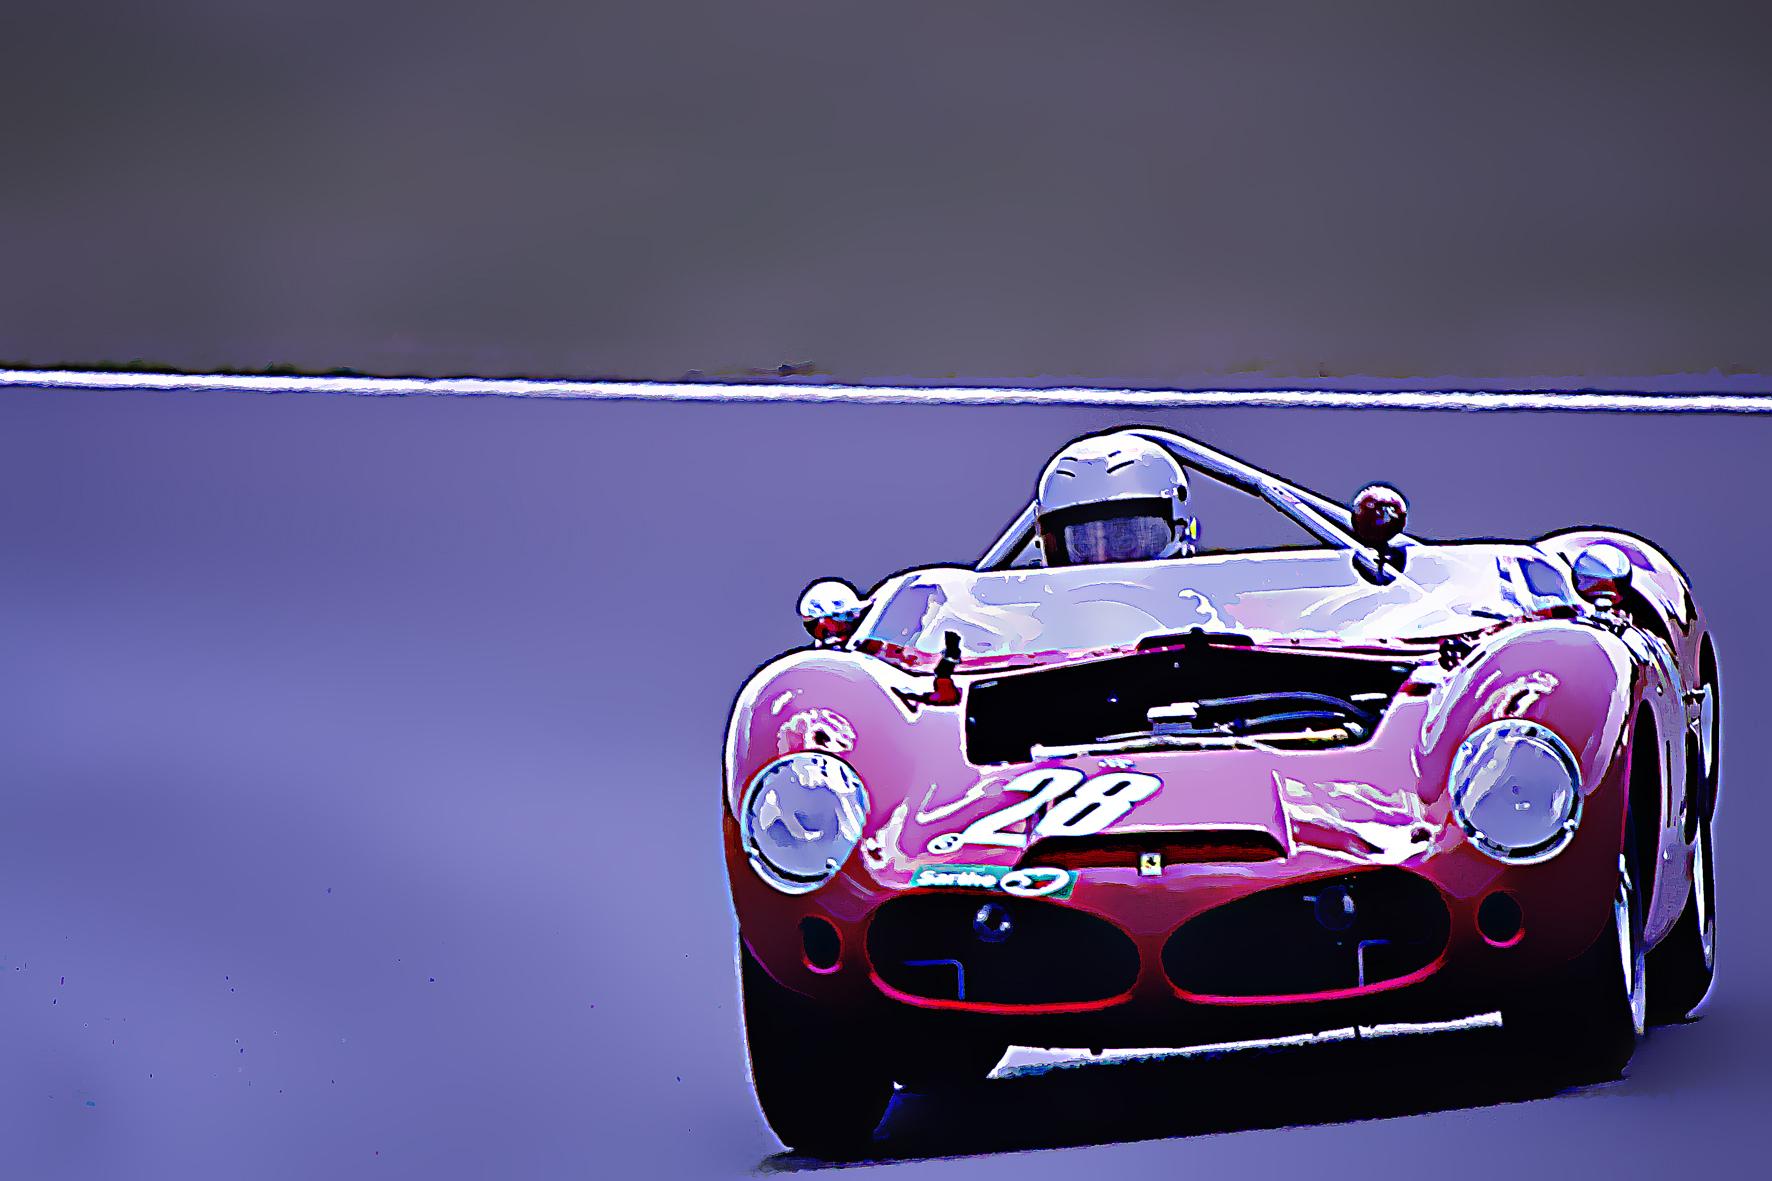 Dino 246 SP Châssis 0790 L6 1961